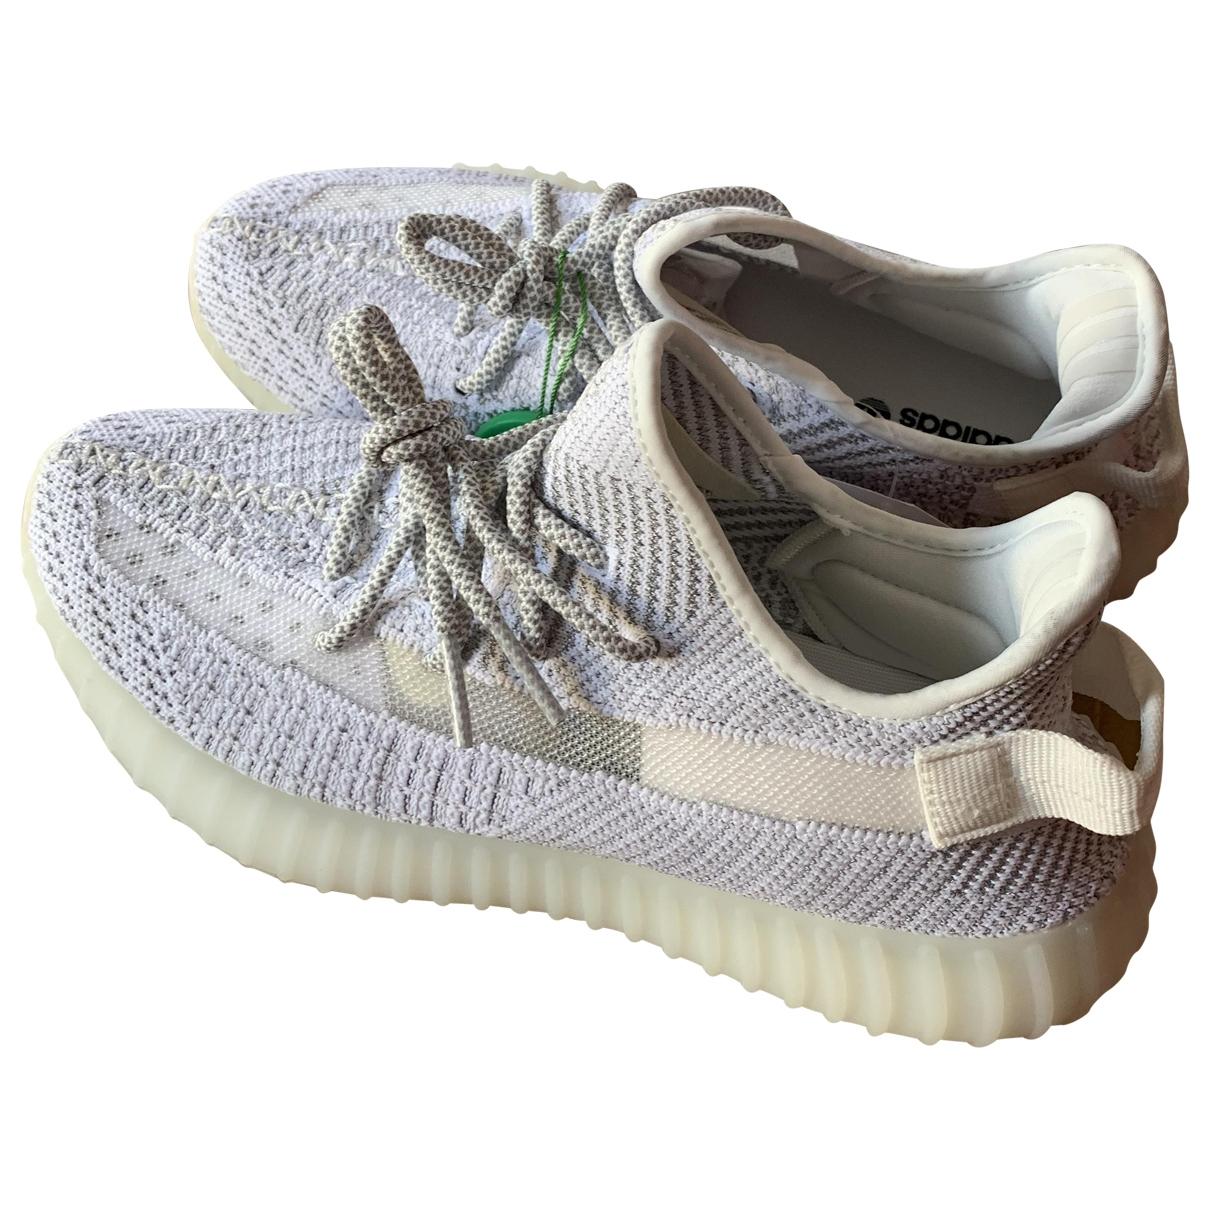 Yeezy X Adidas - Baskets   pour homme en toile - blanc